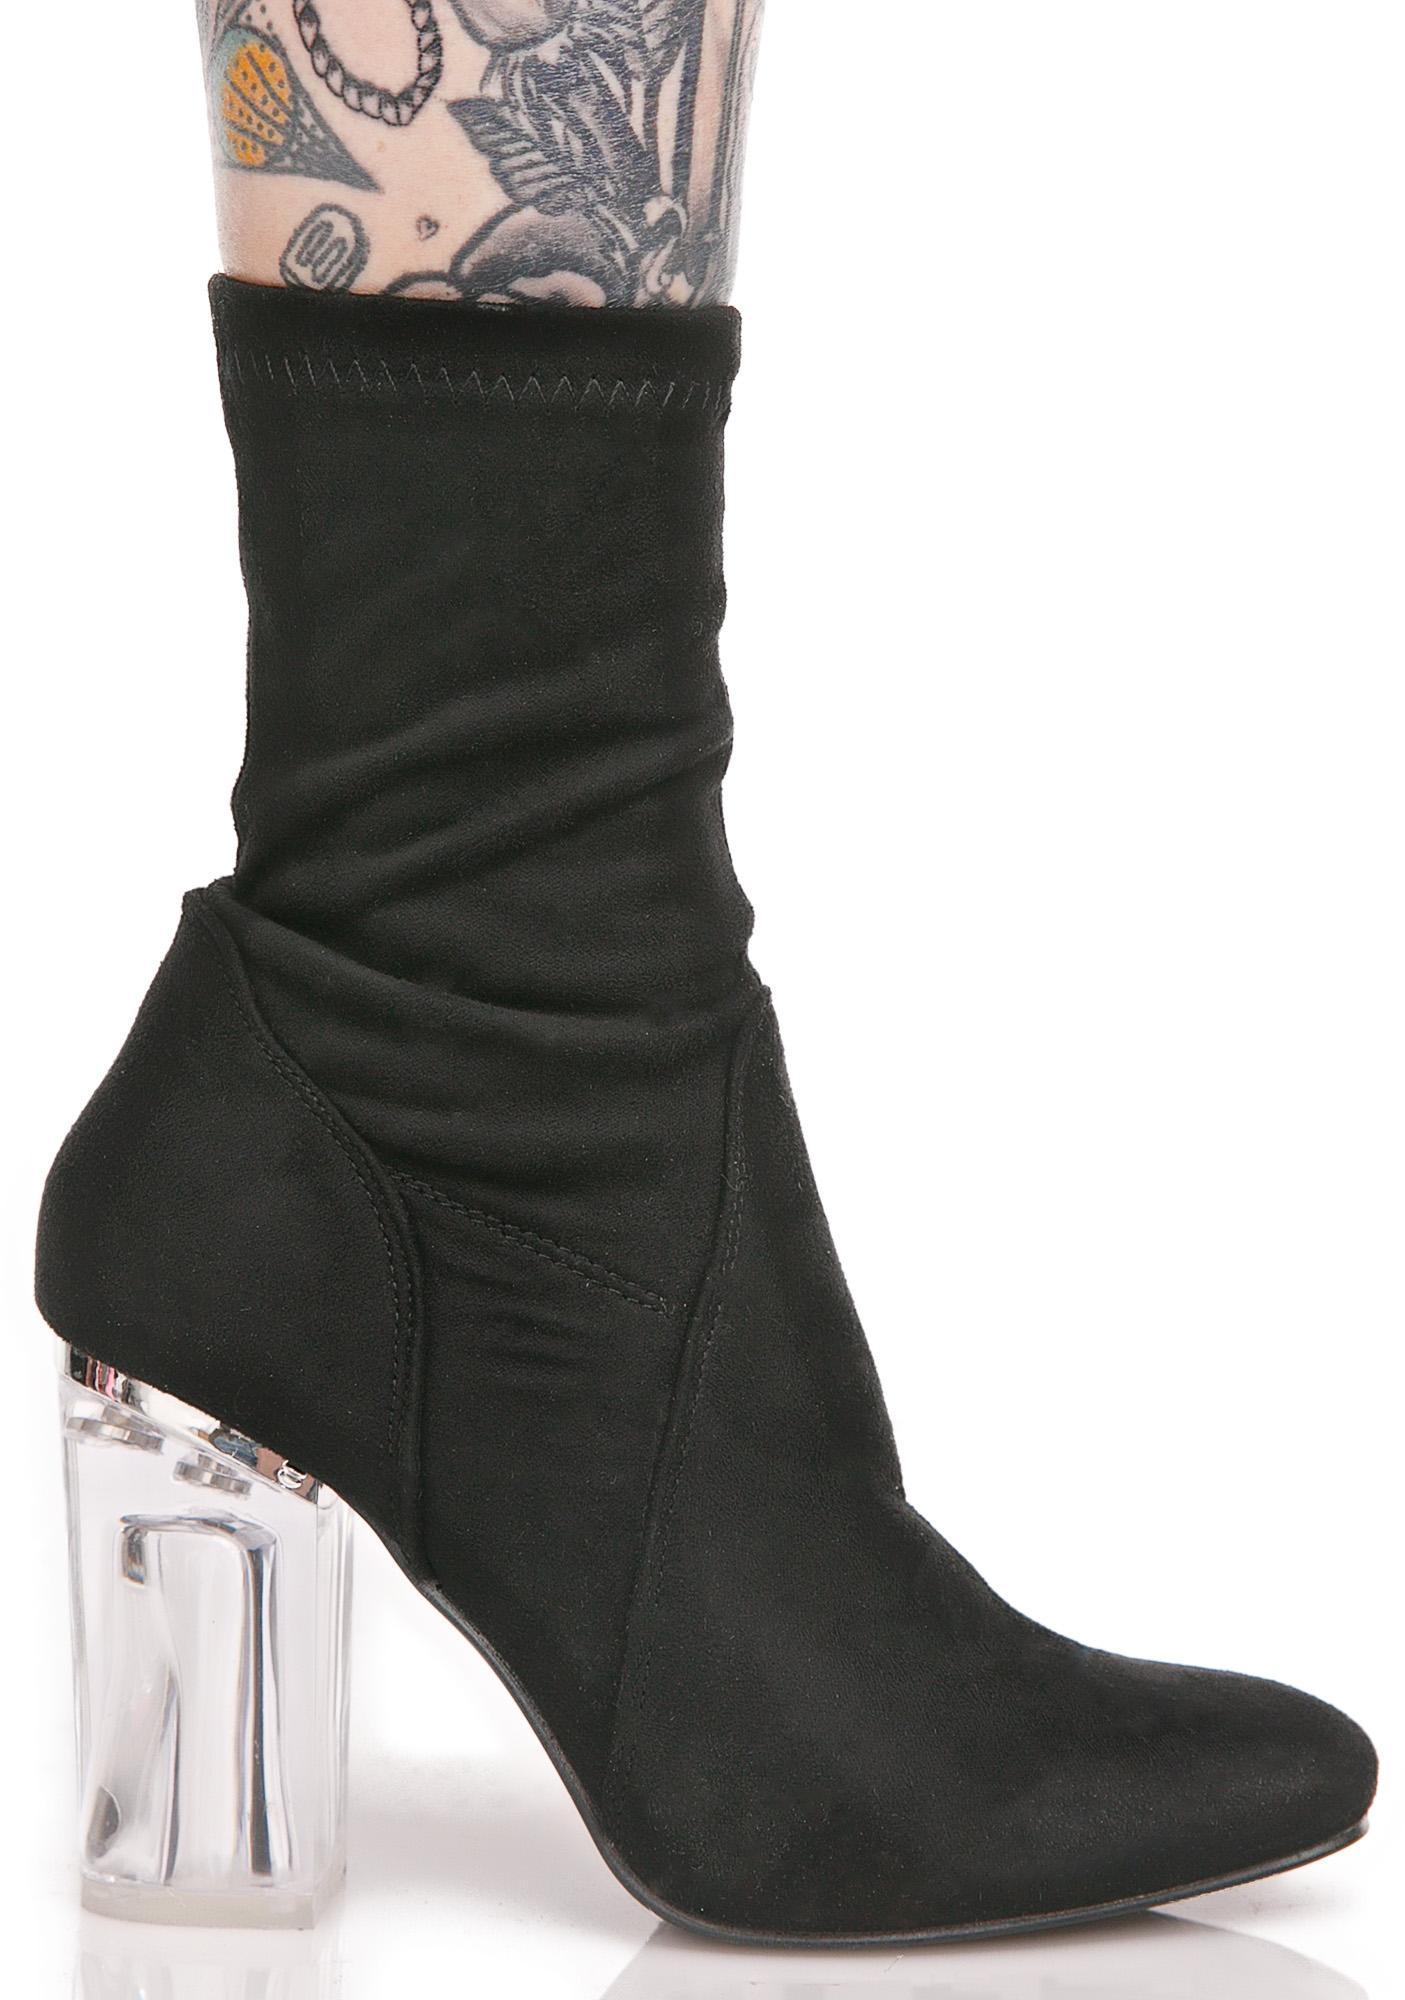 Onyx Saturn Boots